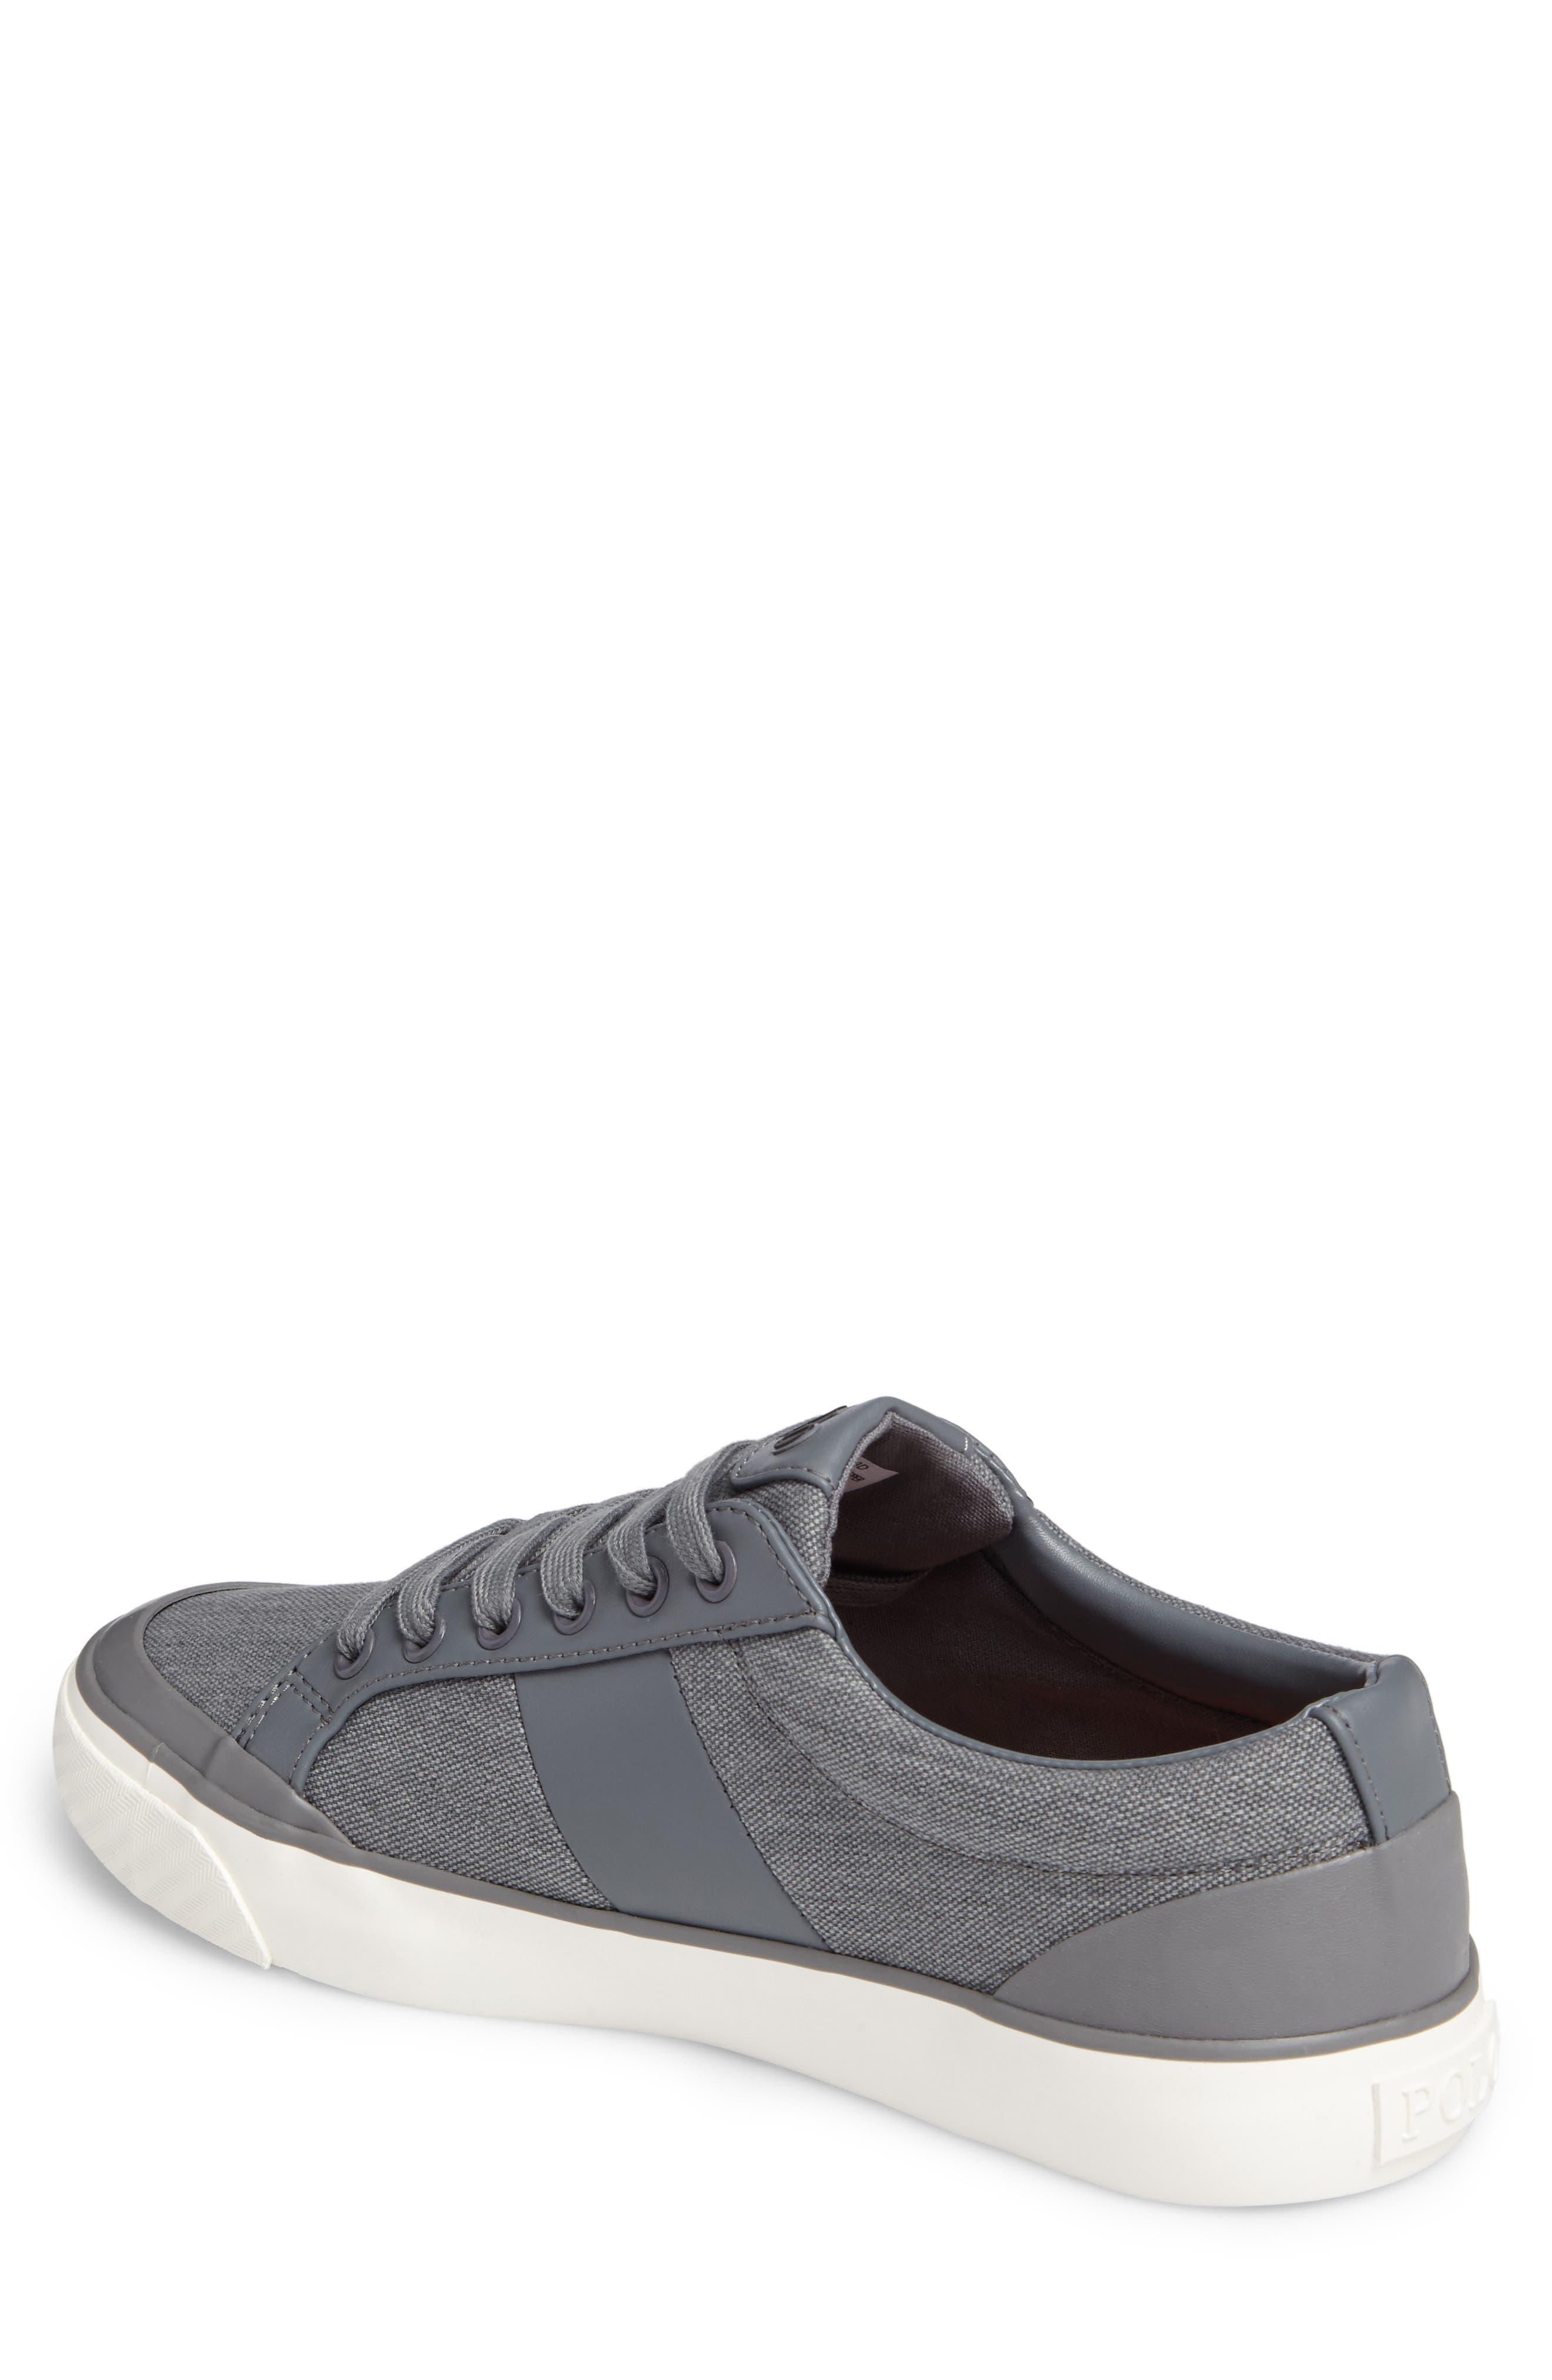 Polo Ralph Lauren Ian Sneaker,                             Alternate thumbnail 2, color,